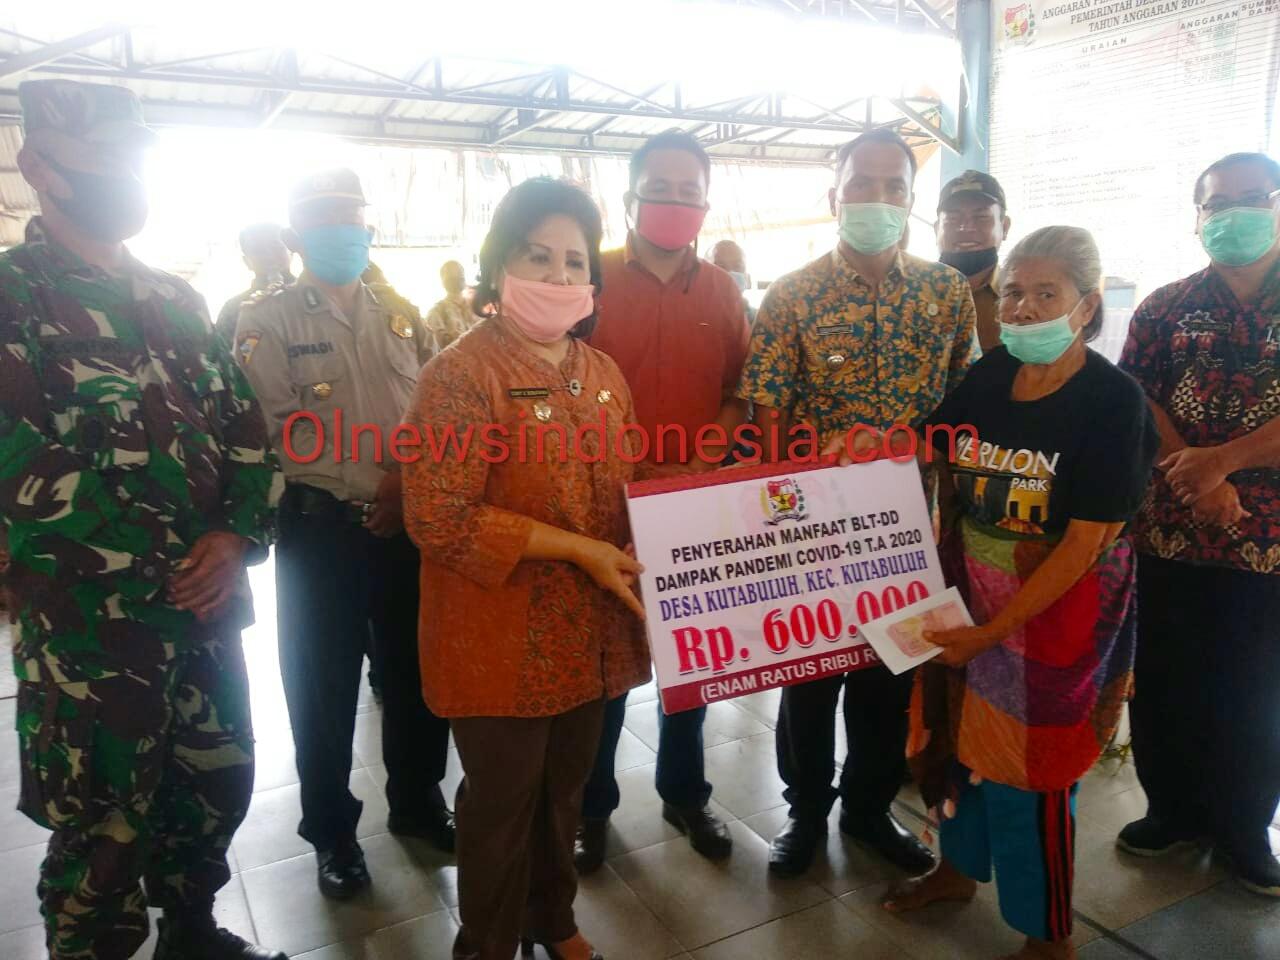 Ket foto : Tampak Wakil Bupati Karo Cory Seriwaty Br Sebayang Memberikan Bantuan BLTDD  secara simbolis di Desa Kuta Buluh Kecamatan Buluh (12/06) 2020 (Ist)